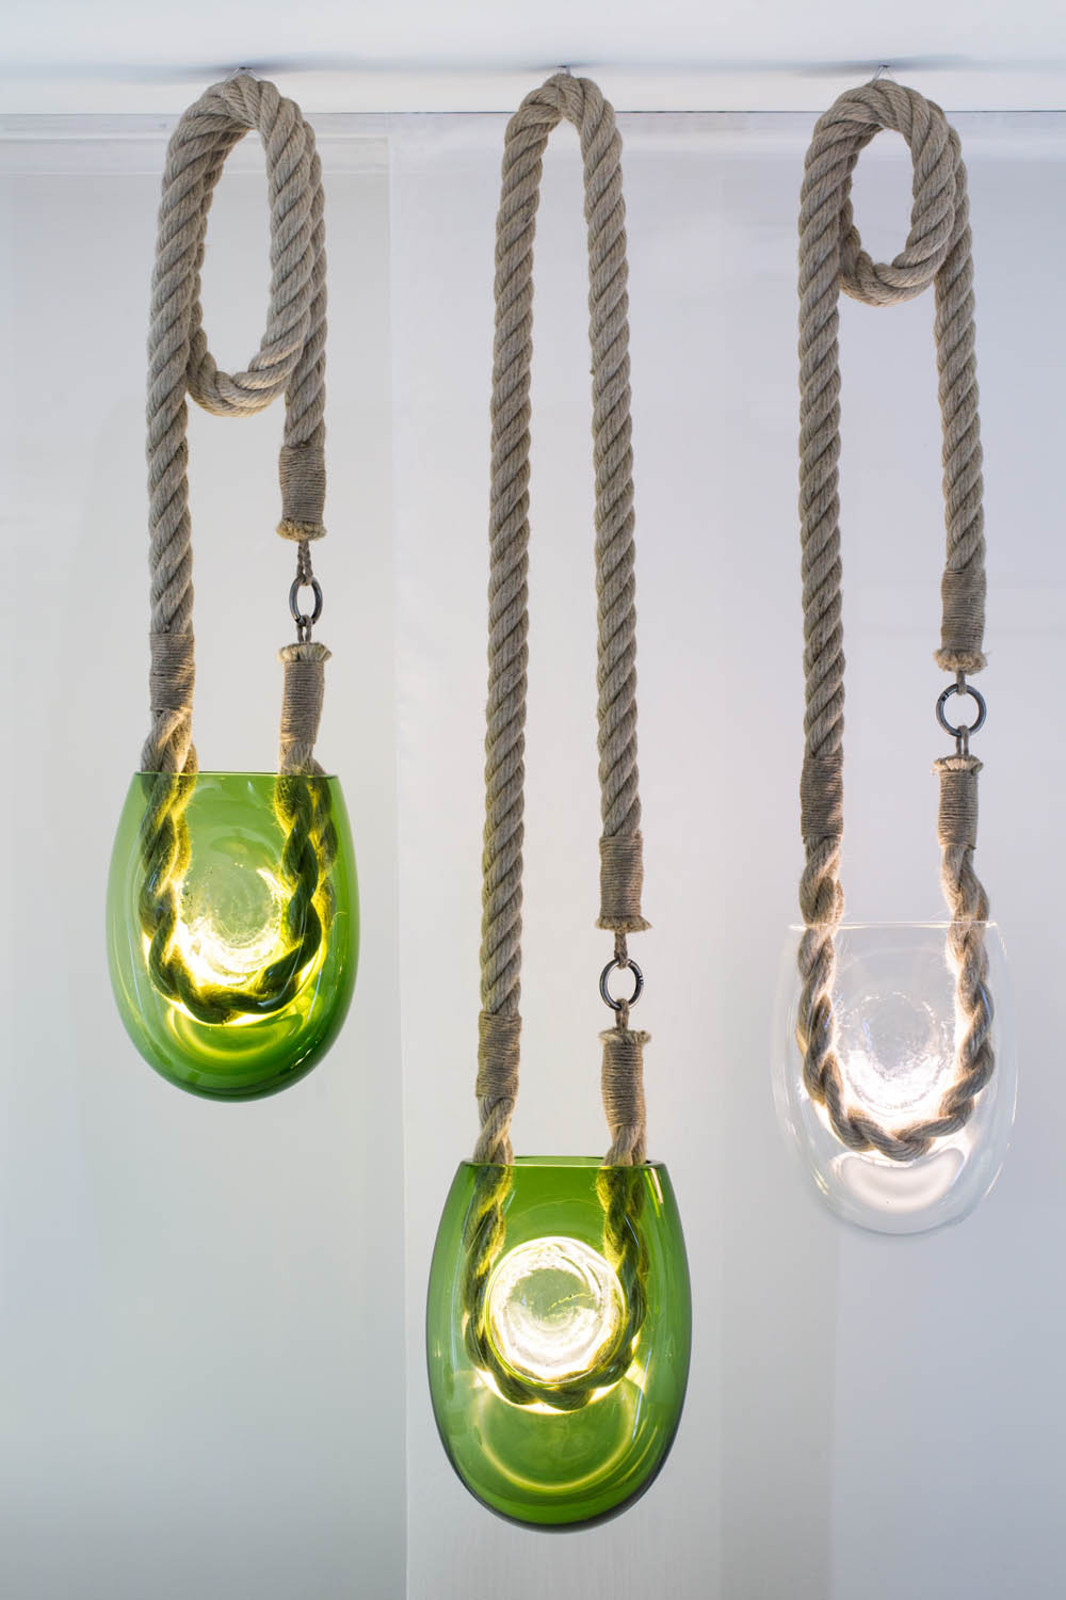 Lamp, Hissa Lantern Dual Land project, 2015